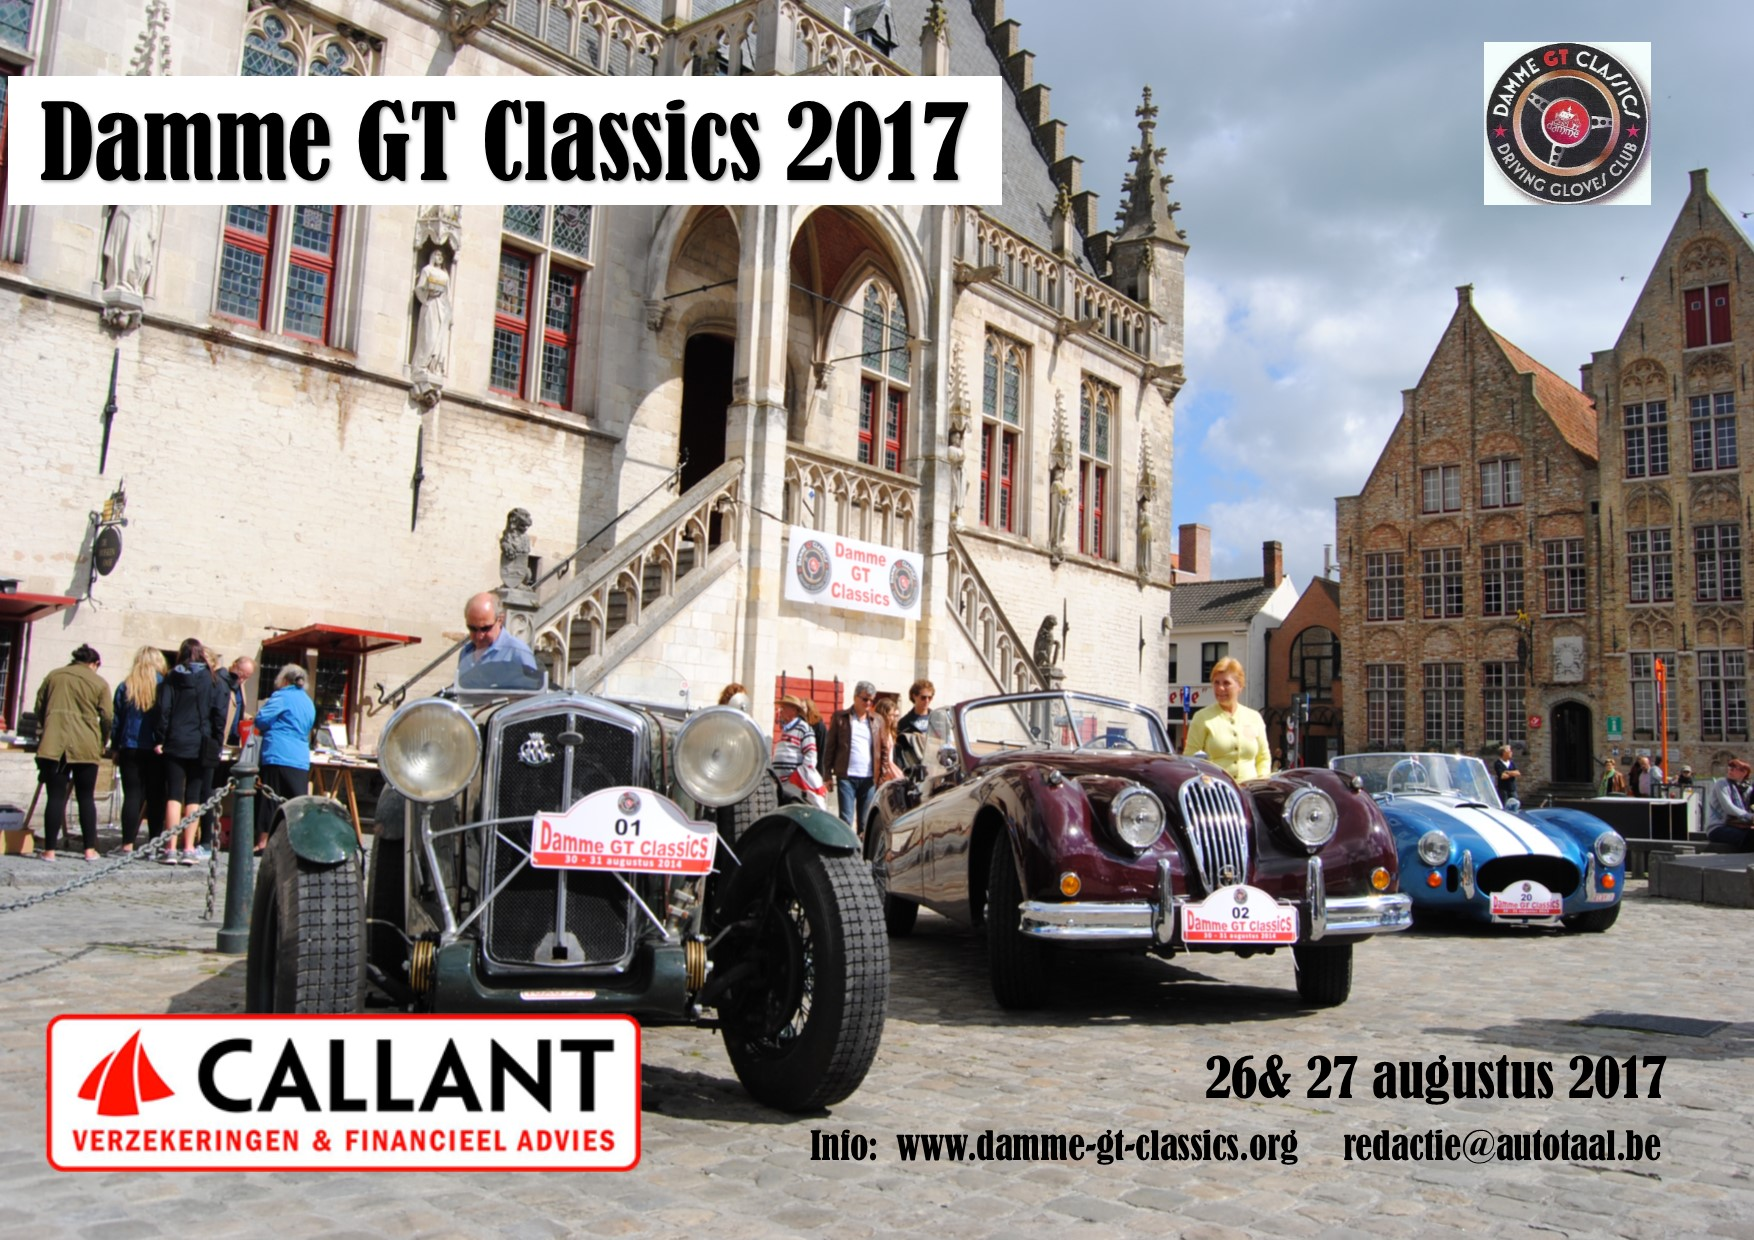 Damme GT Classics 2017